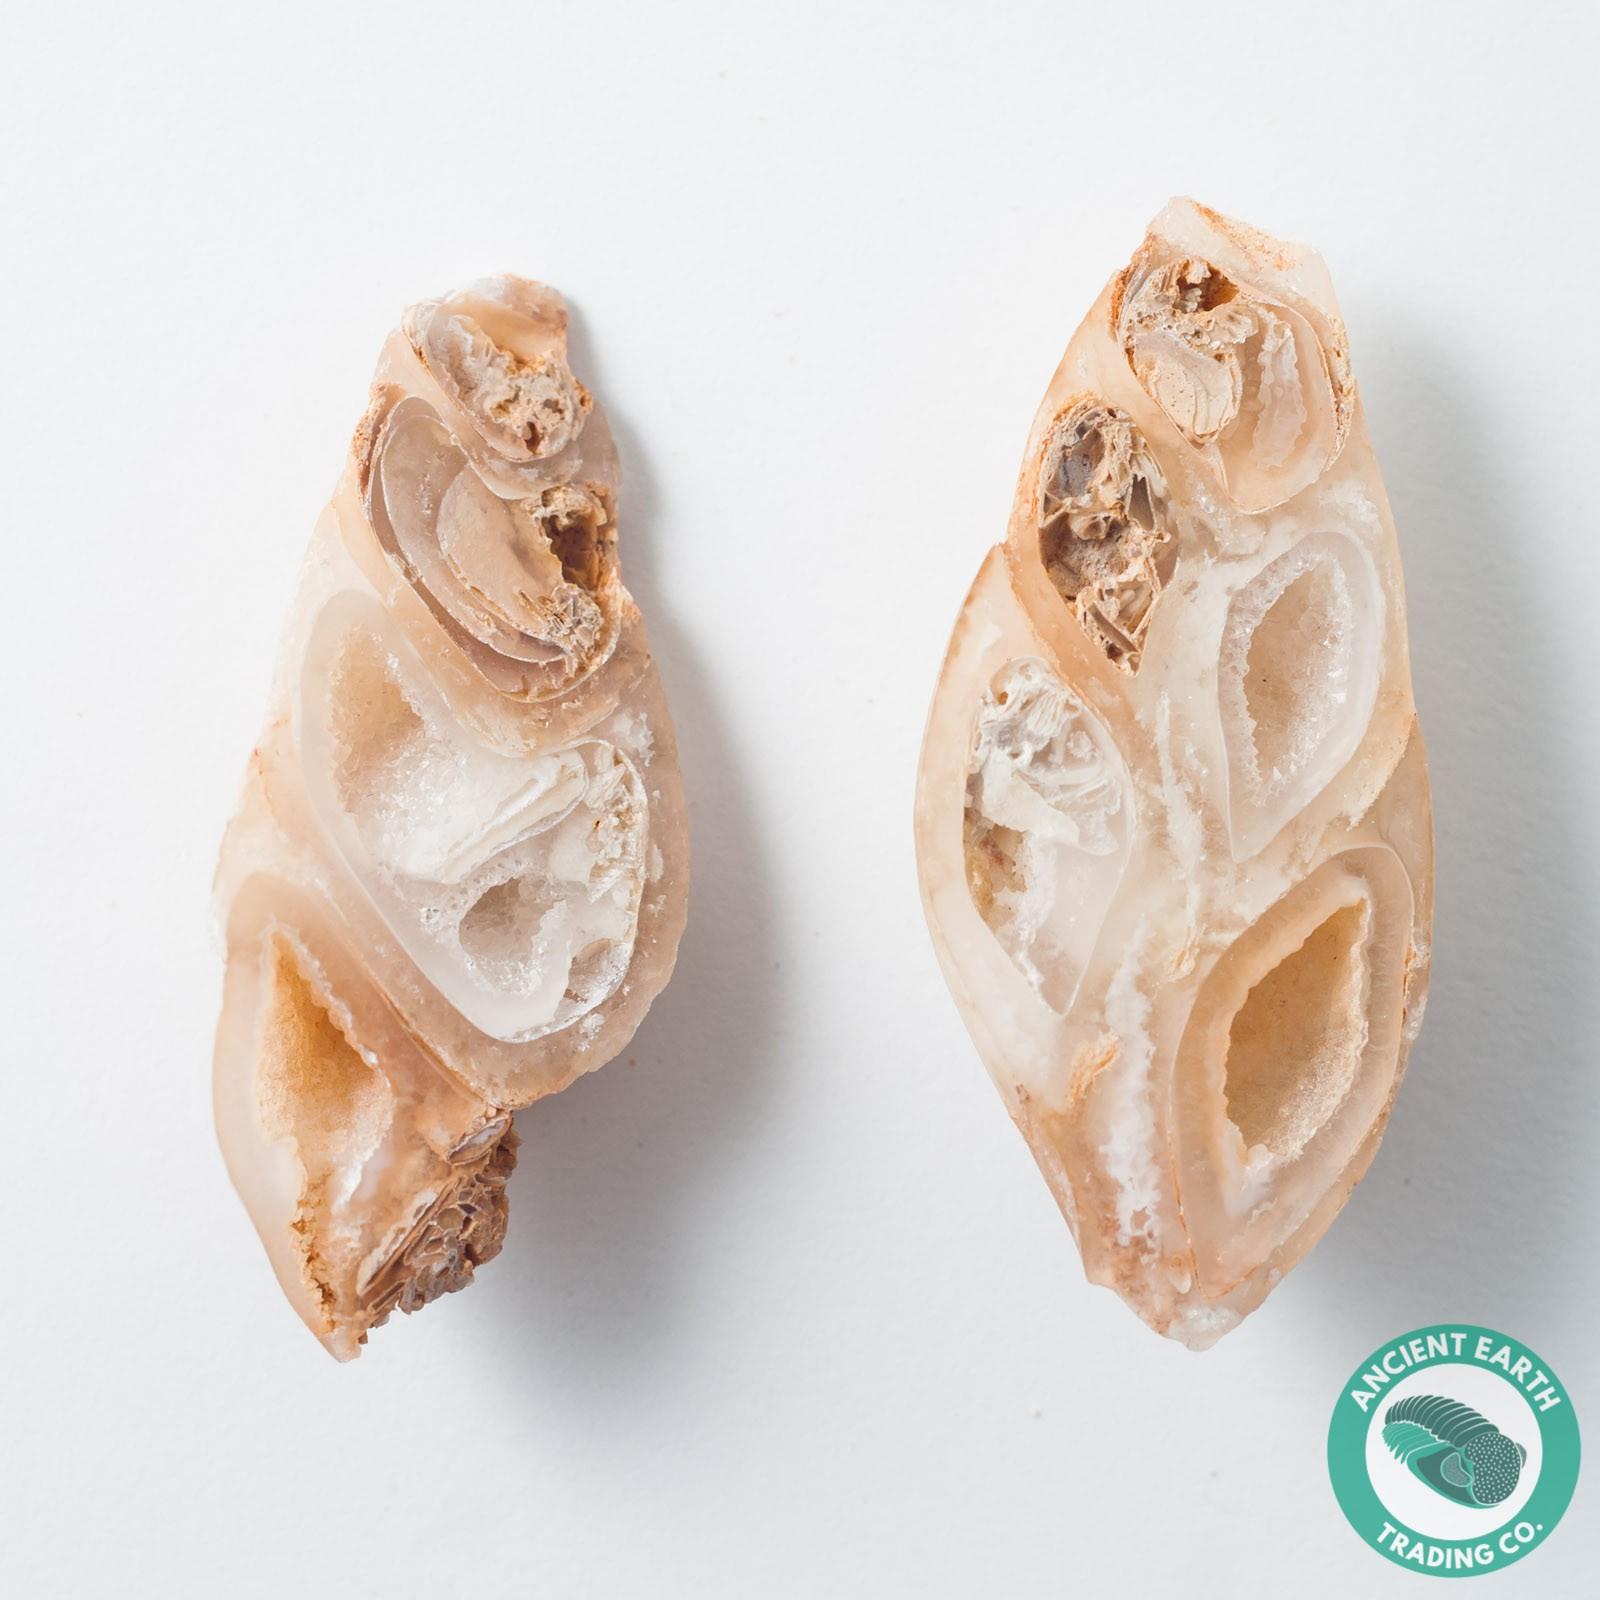 1.81 in Polished Agate Split Pair Sea Snail Gastropod from Western Sahara